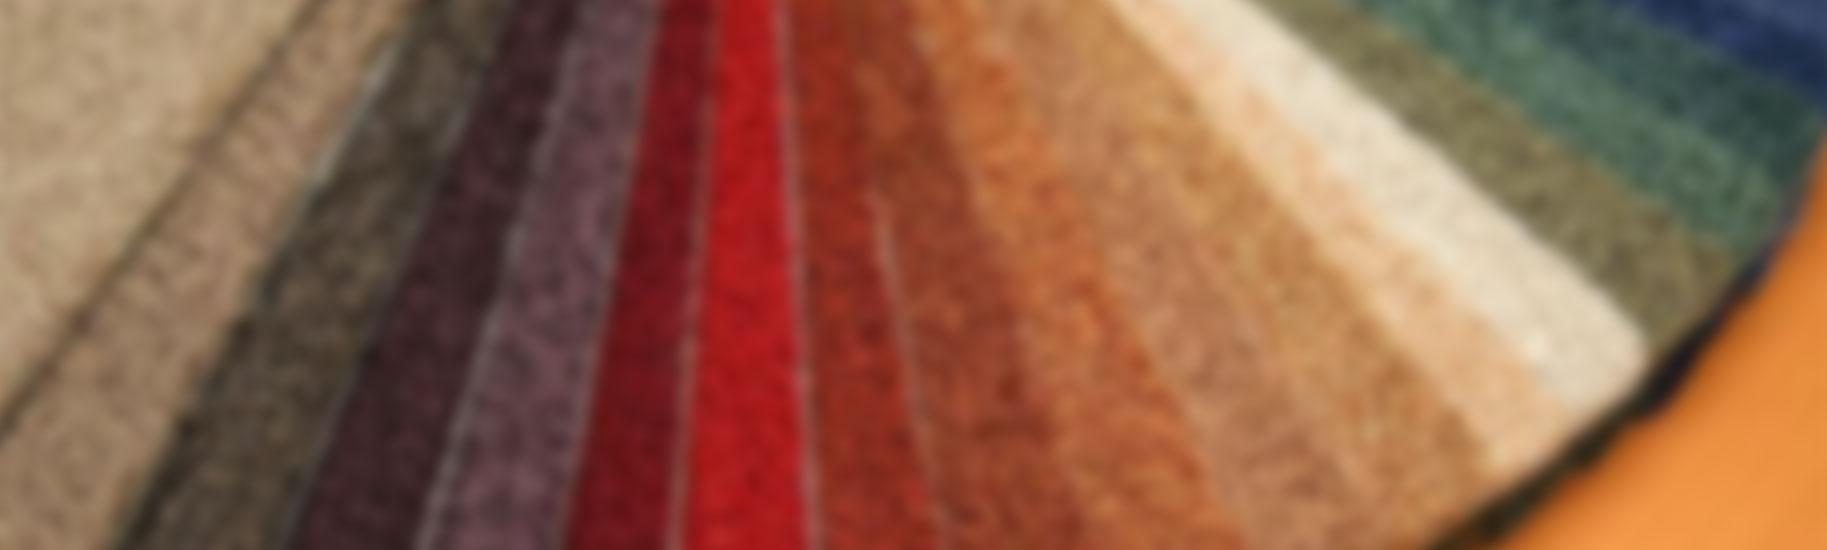 Americolor Dye America S Largest Carpet Dye Company